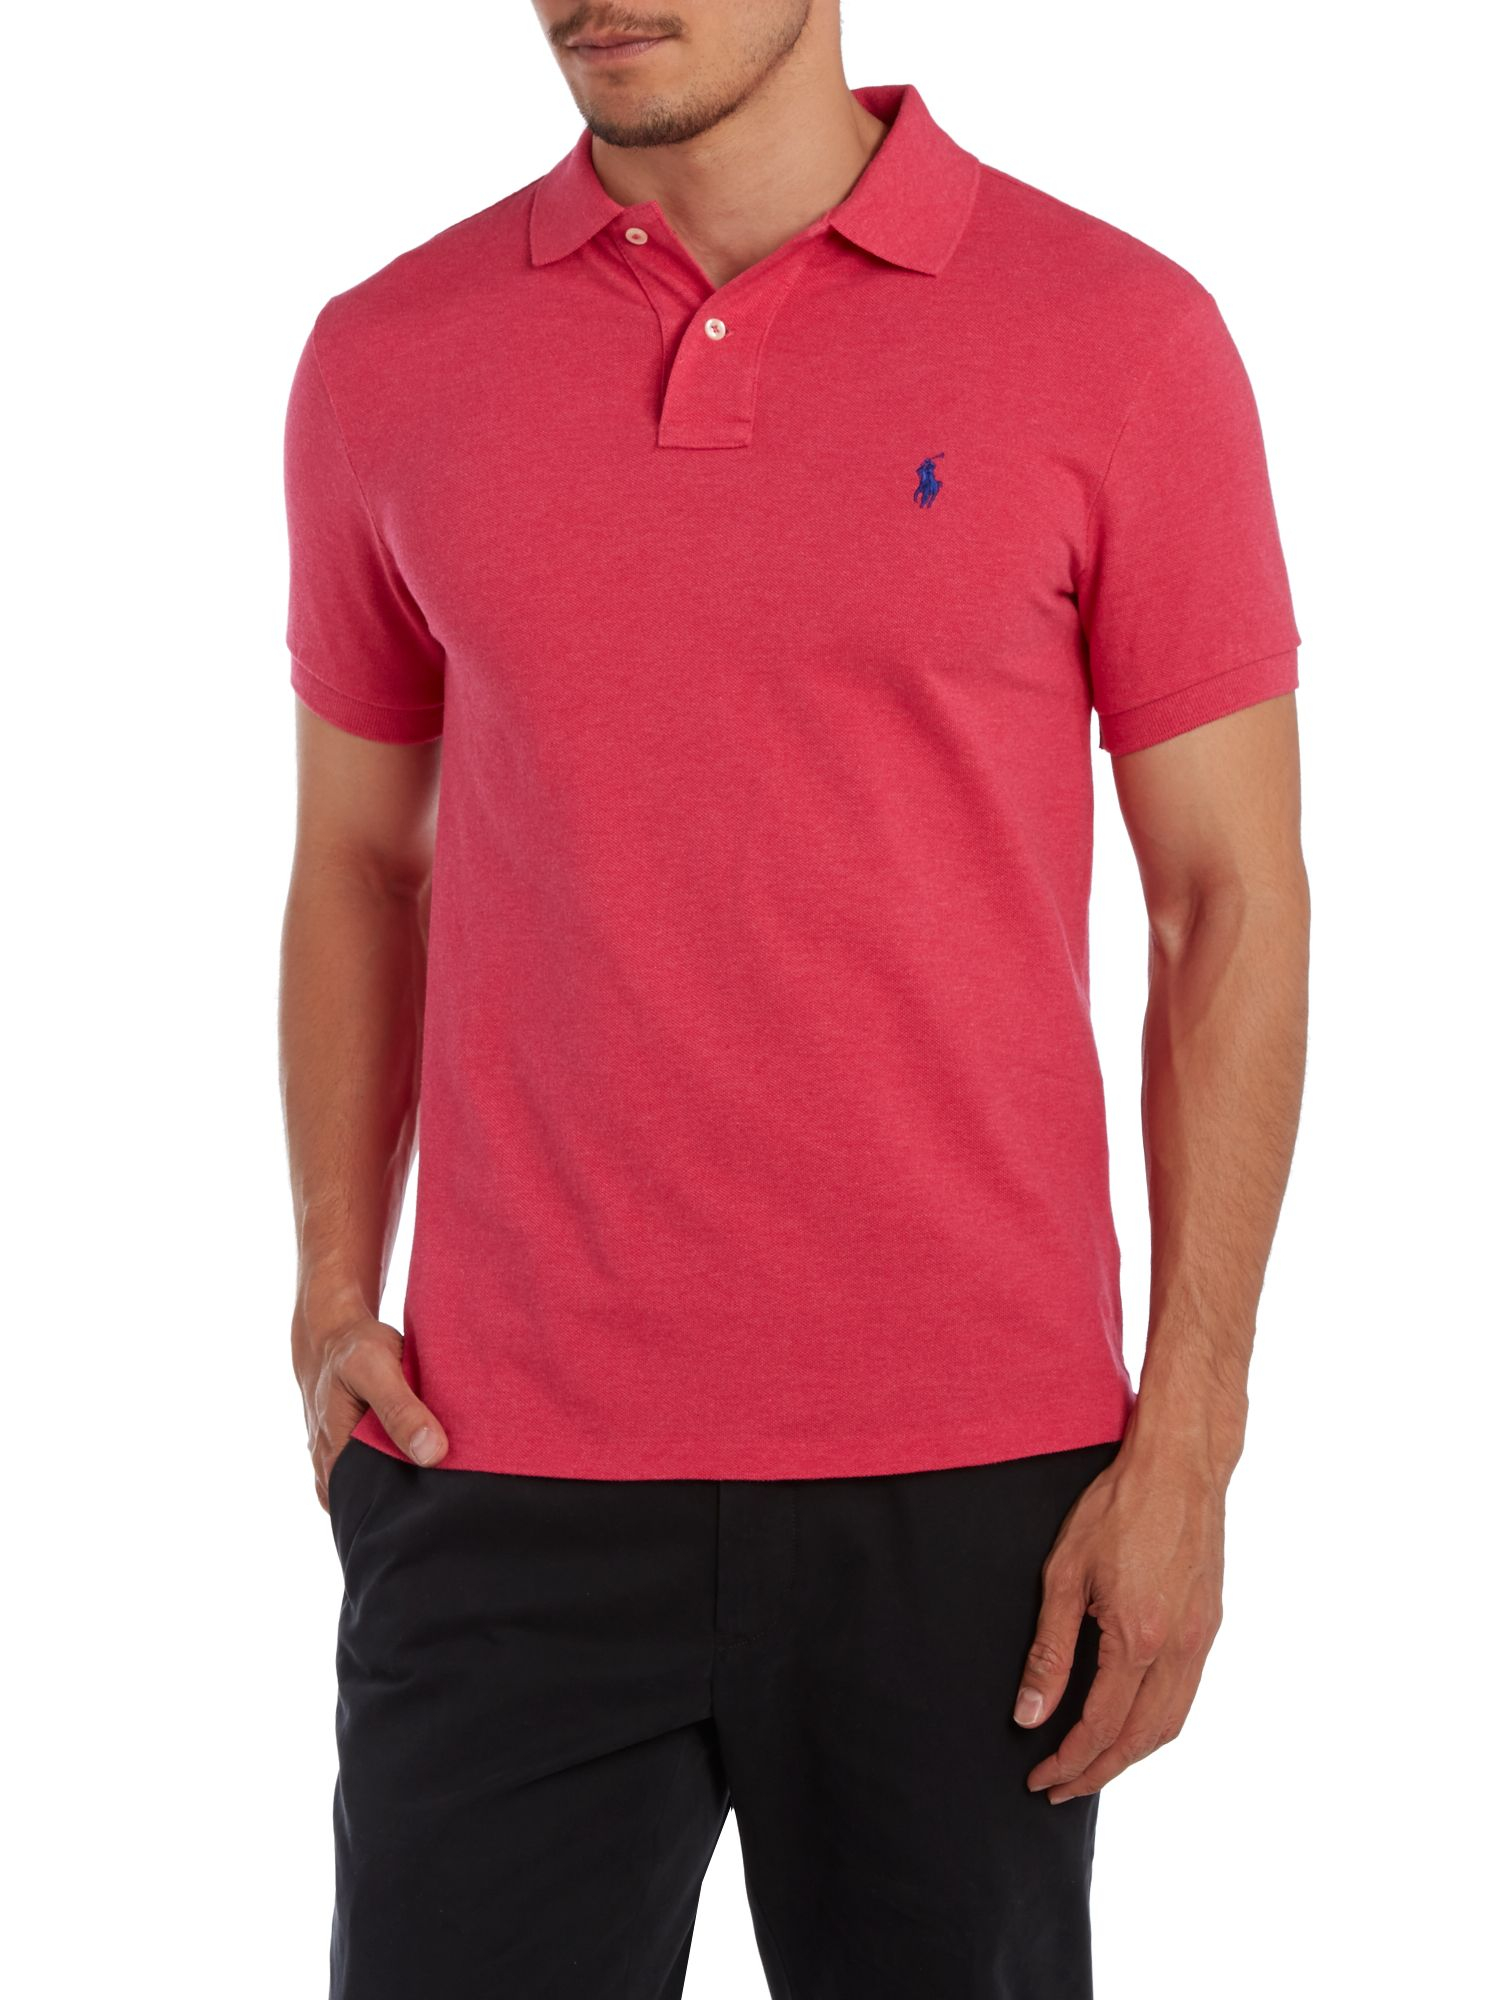 Polo Ralph Lauren Slim Fit Short Sleeve Mesh Polo Shirt In